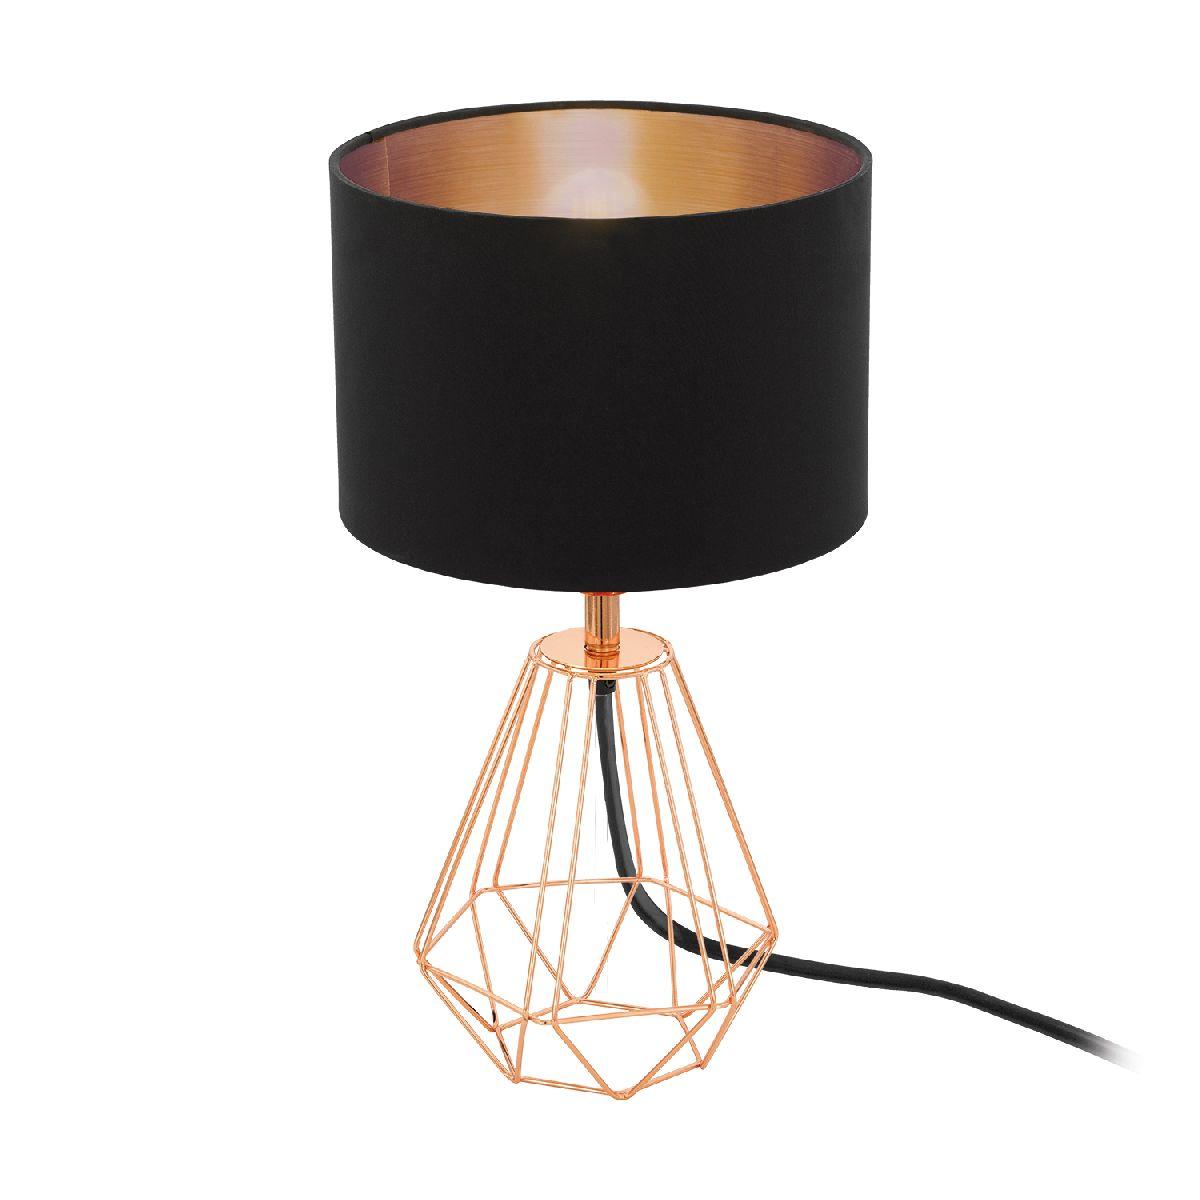 Lampade Da Tavolo Ikea Modello Tertial : Lampade da comodino ikea cheap